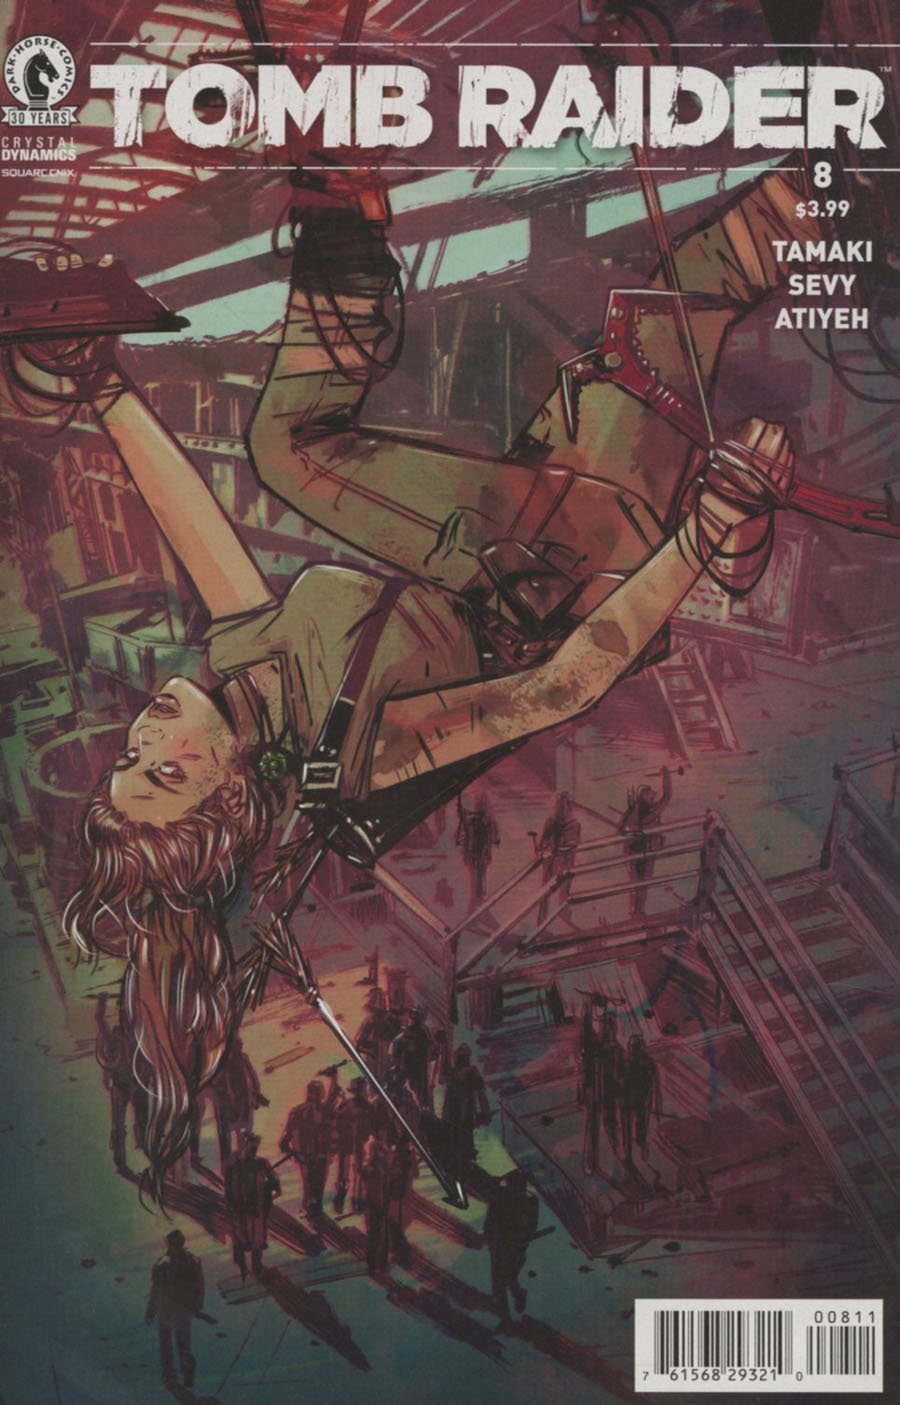 Tomb Raider Vol 3 #8